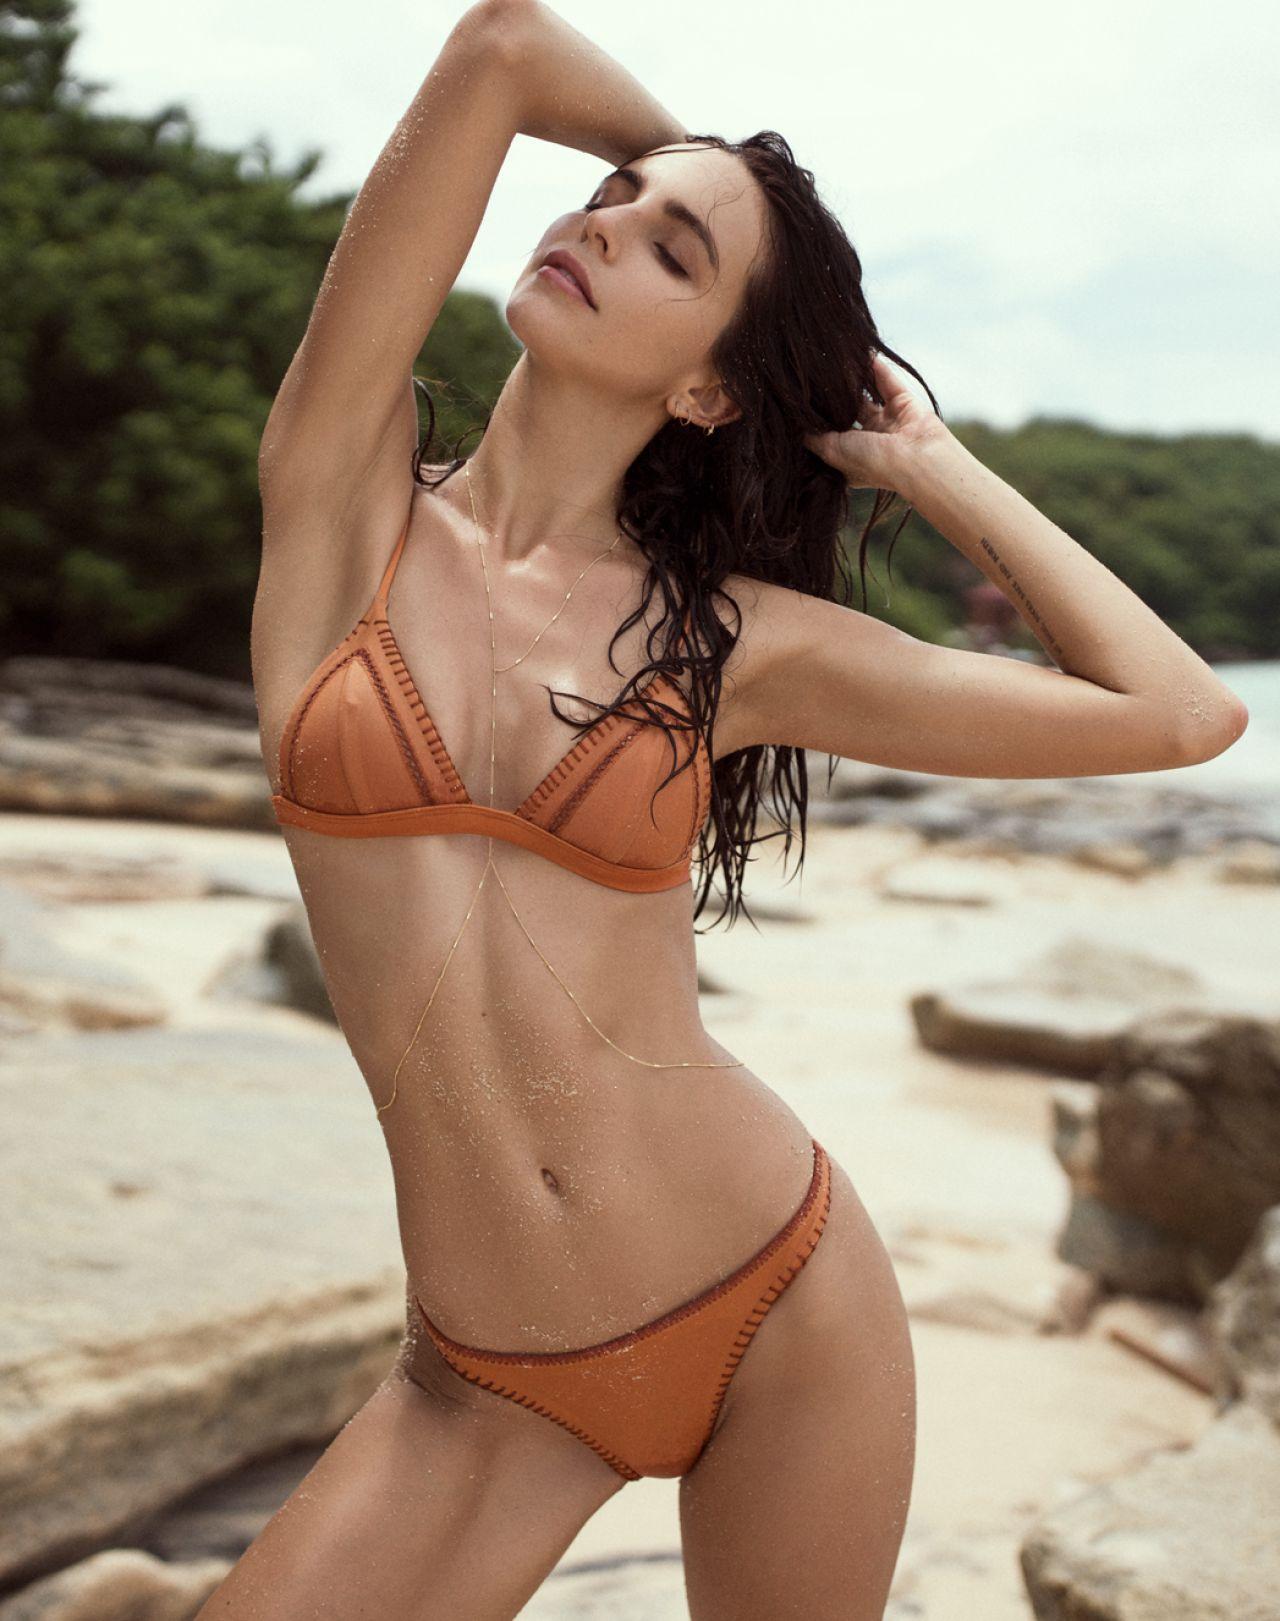 Bikini Amanda Pizziconi naked (16 photo), Hot